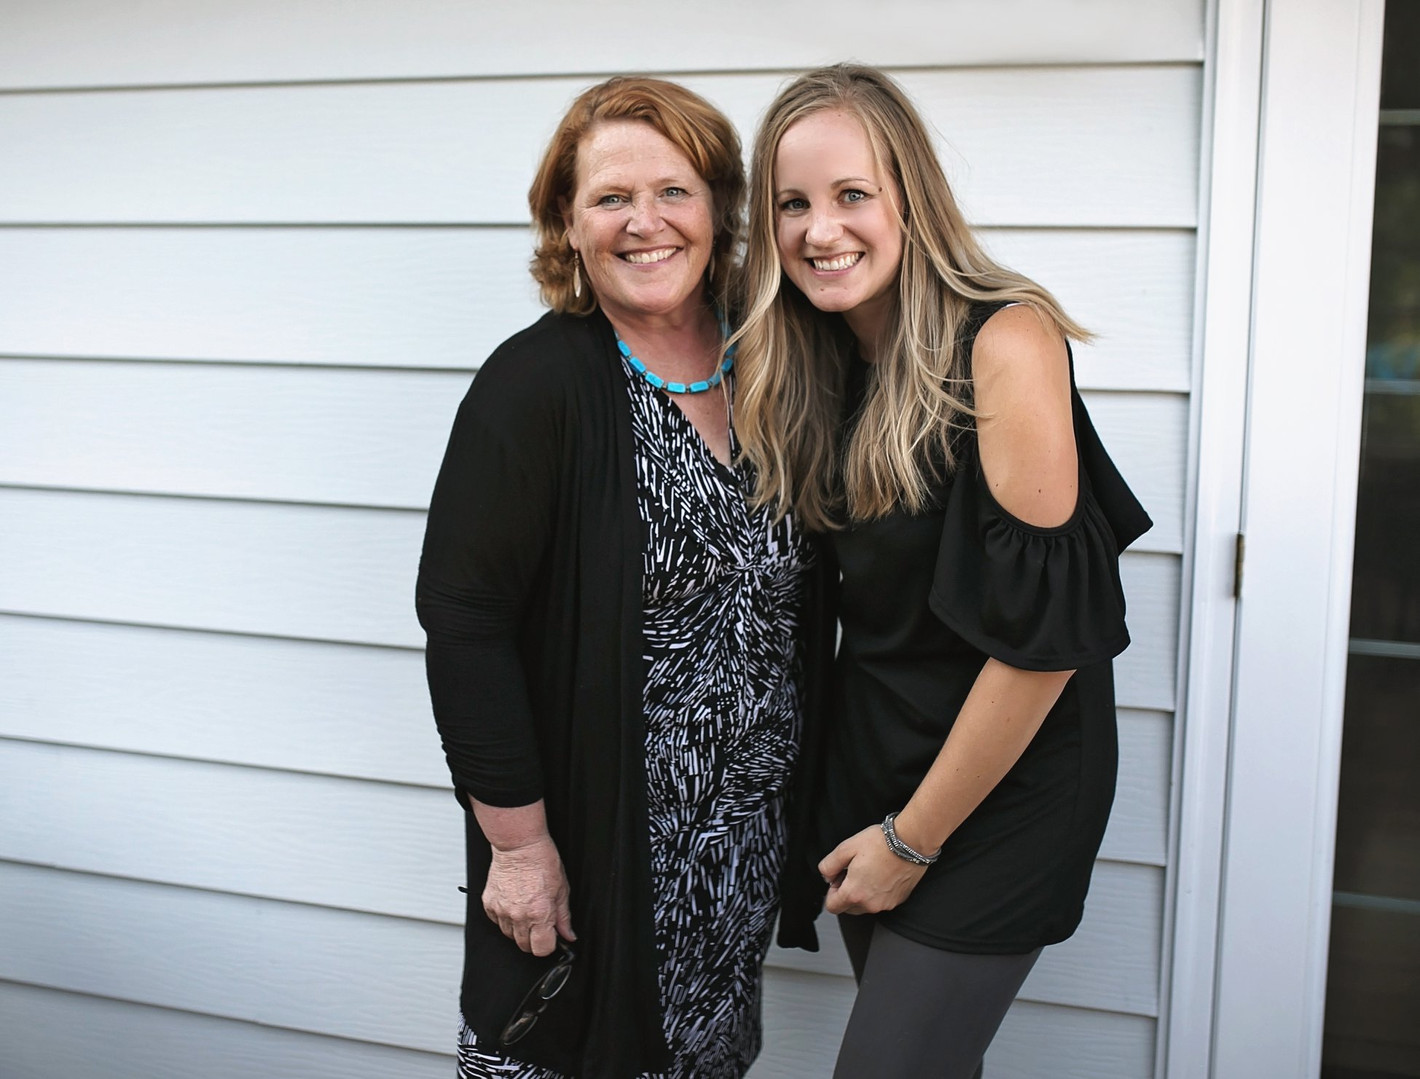 Kari with Heidi Heitkamp in 2018